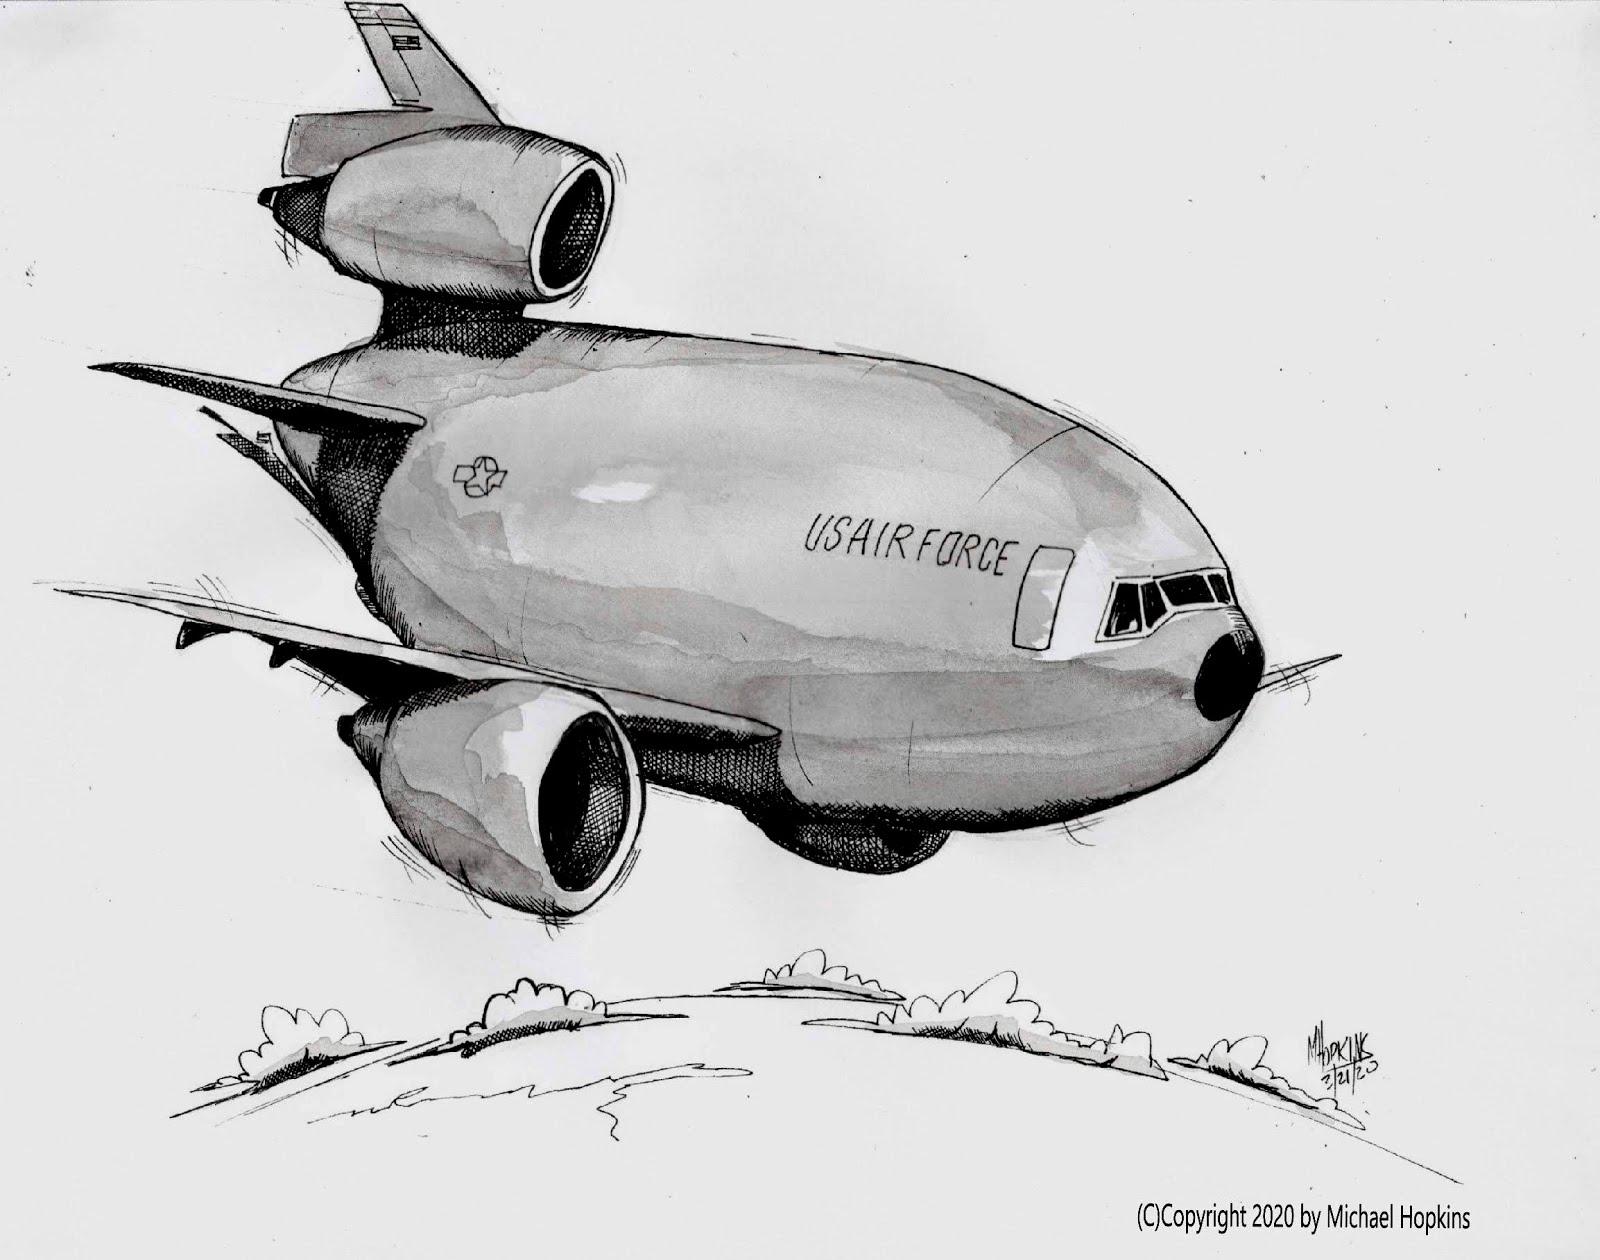 USAF KC-10 - Original Pen & Ink Aviation Caricature by Michael Hopkins on Ebay!